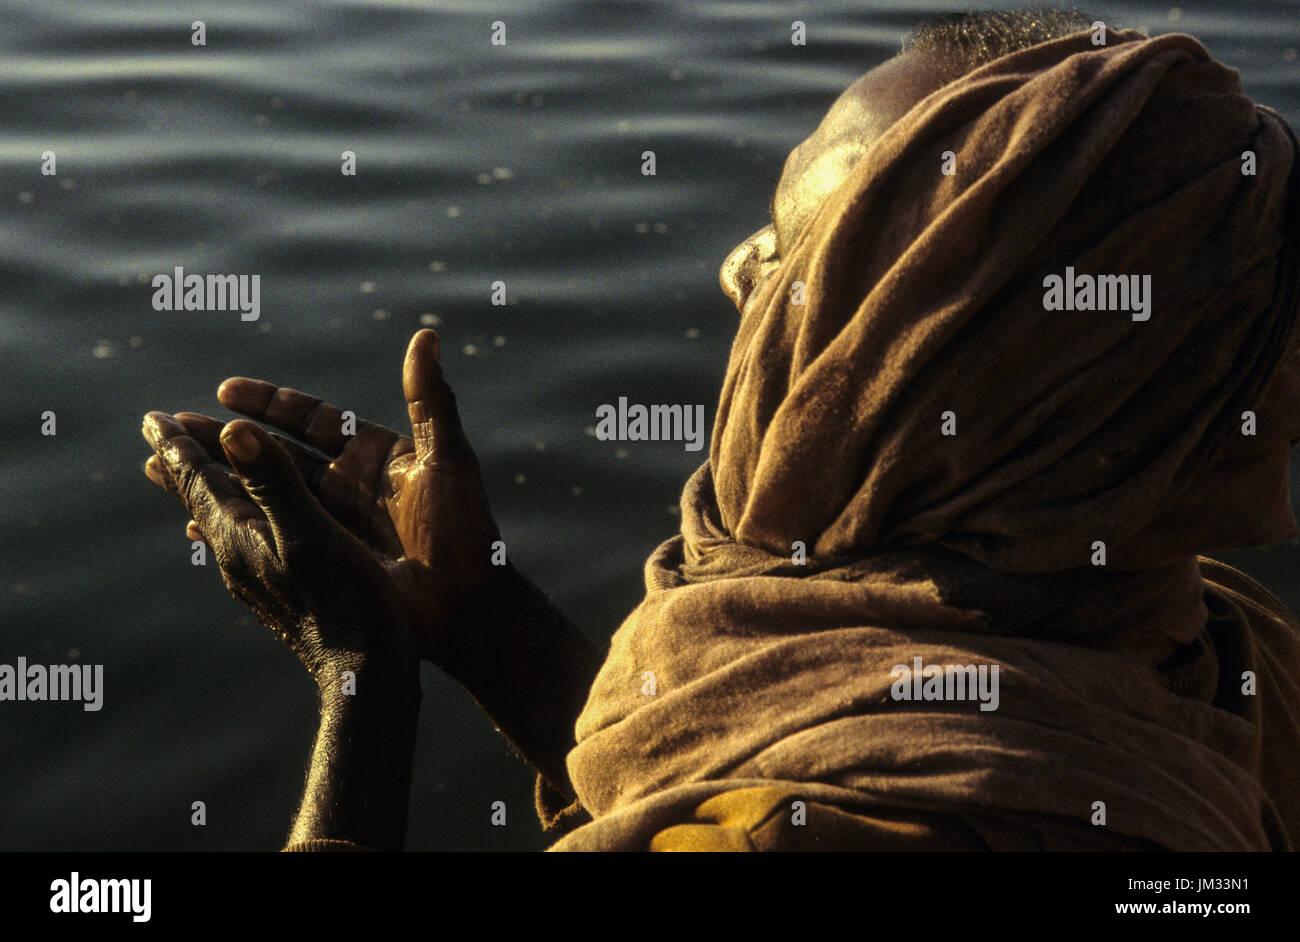 INDIA, Uttar Pradesh, Varanasi, a Hindu man at morning